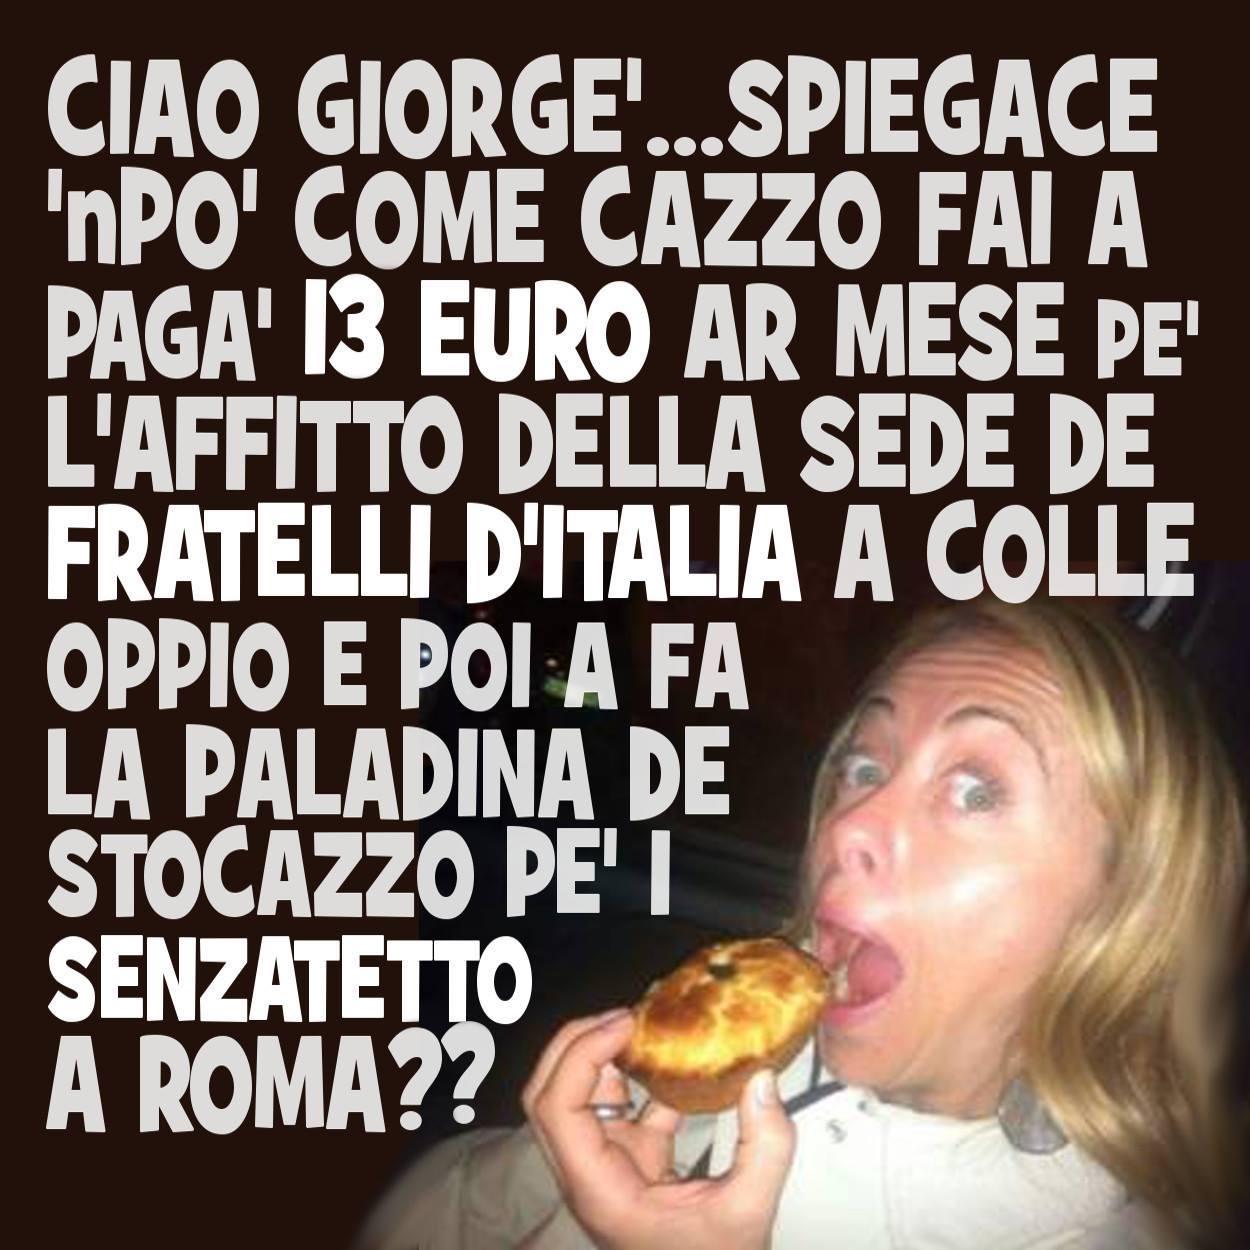 CV Giorgia Meloni e Fratelli d'Italia